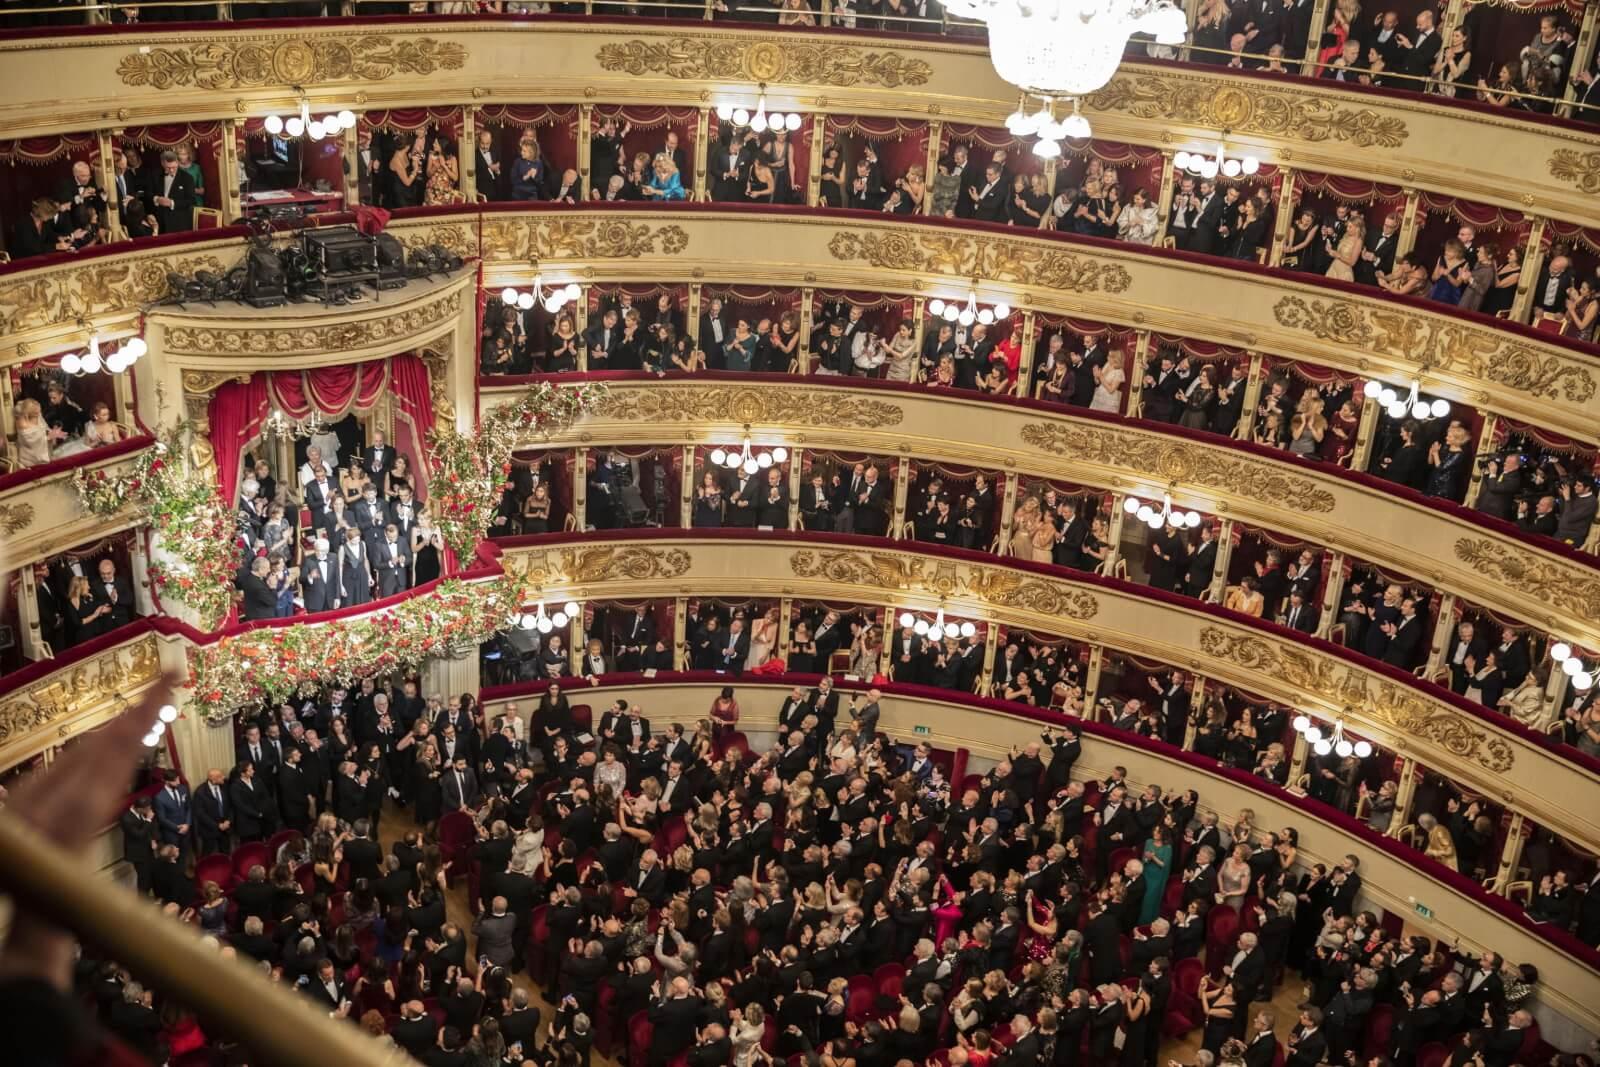 Opera La Scala fot. EPA/Ufficio stampa La Scala